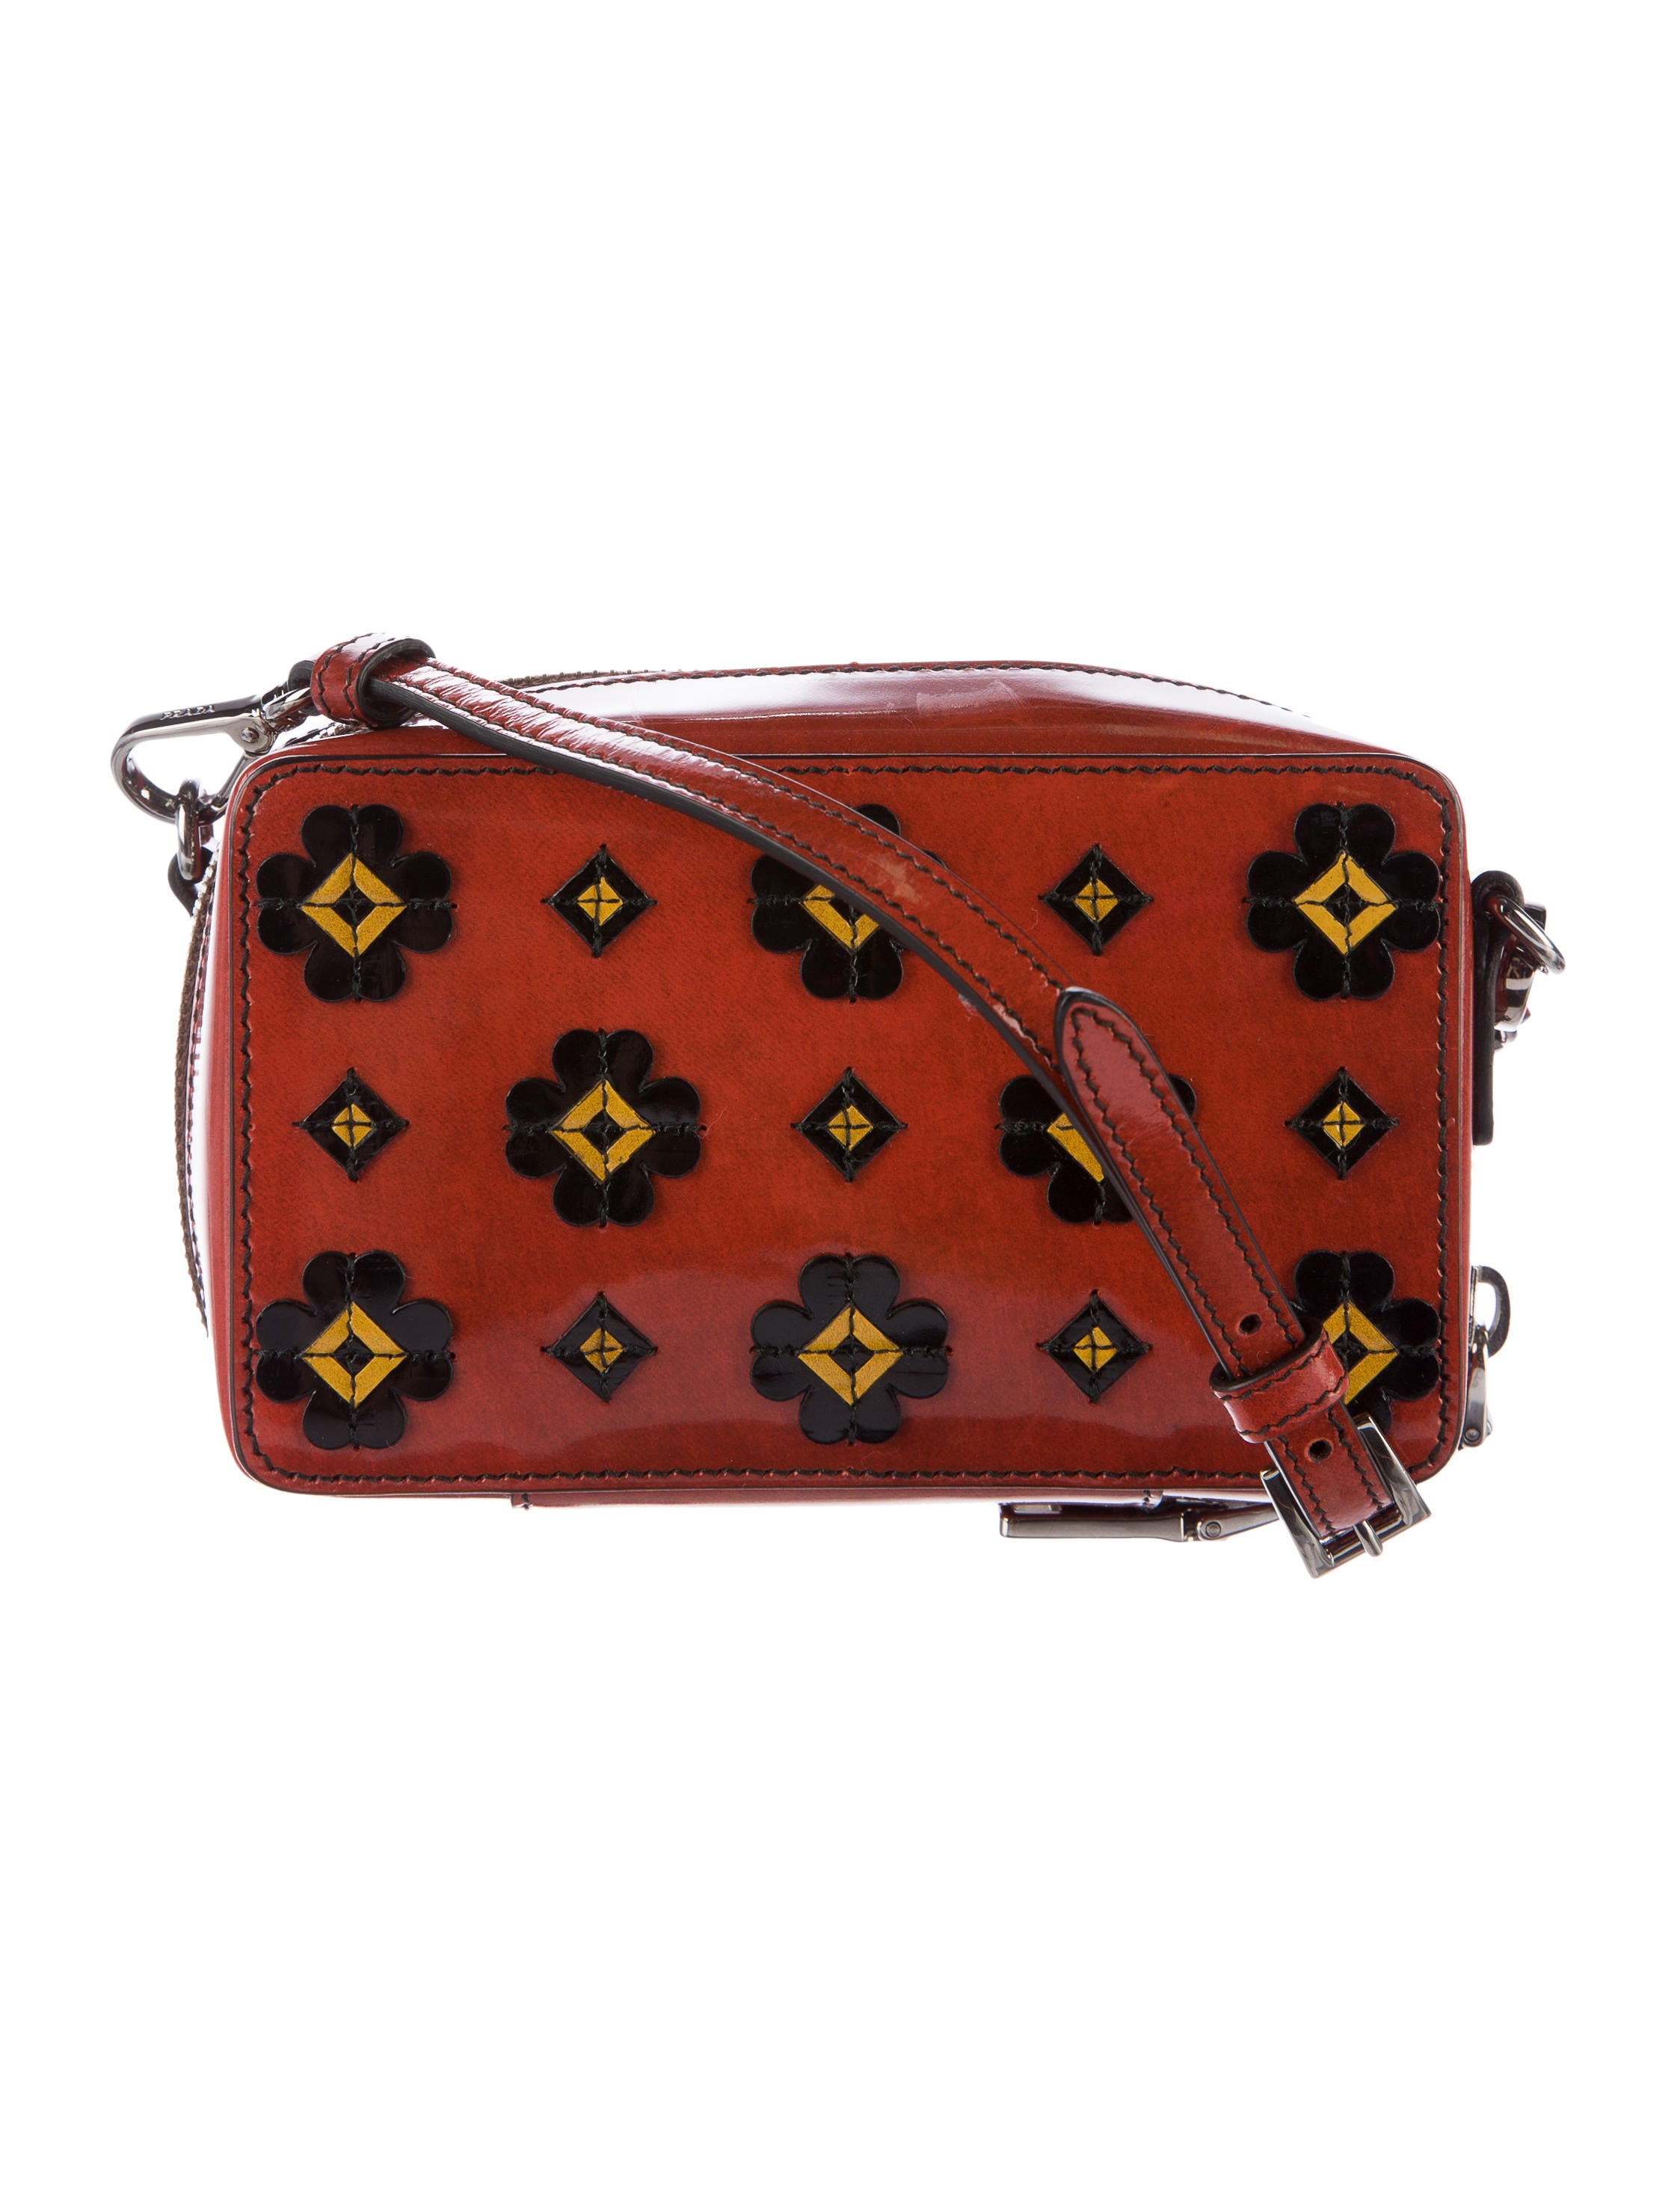 Prada Patent Leather Floral Crossbody Bag - Handbags - PRA142792   The RealReal